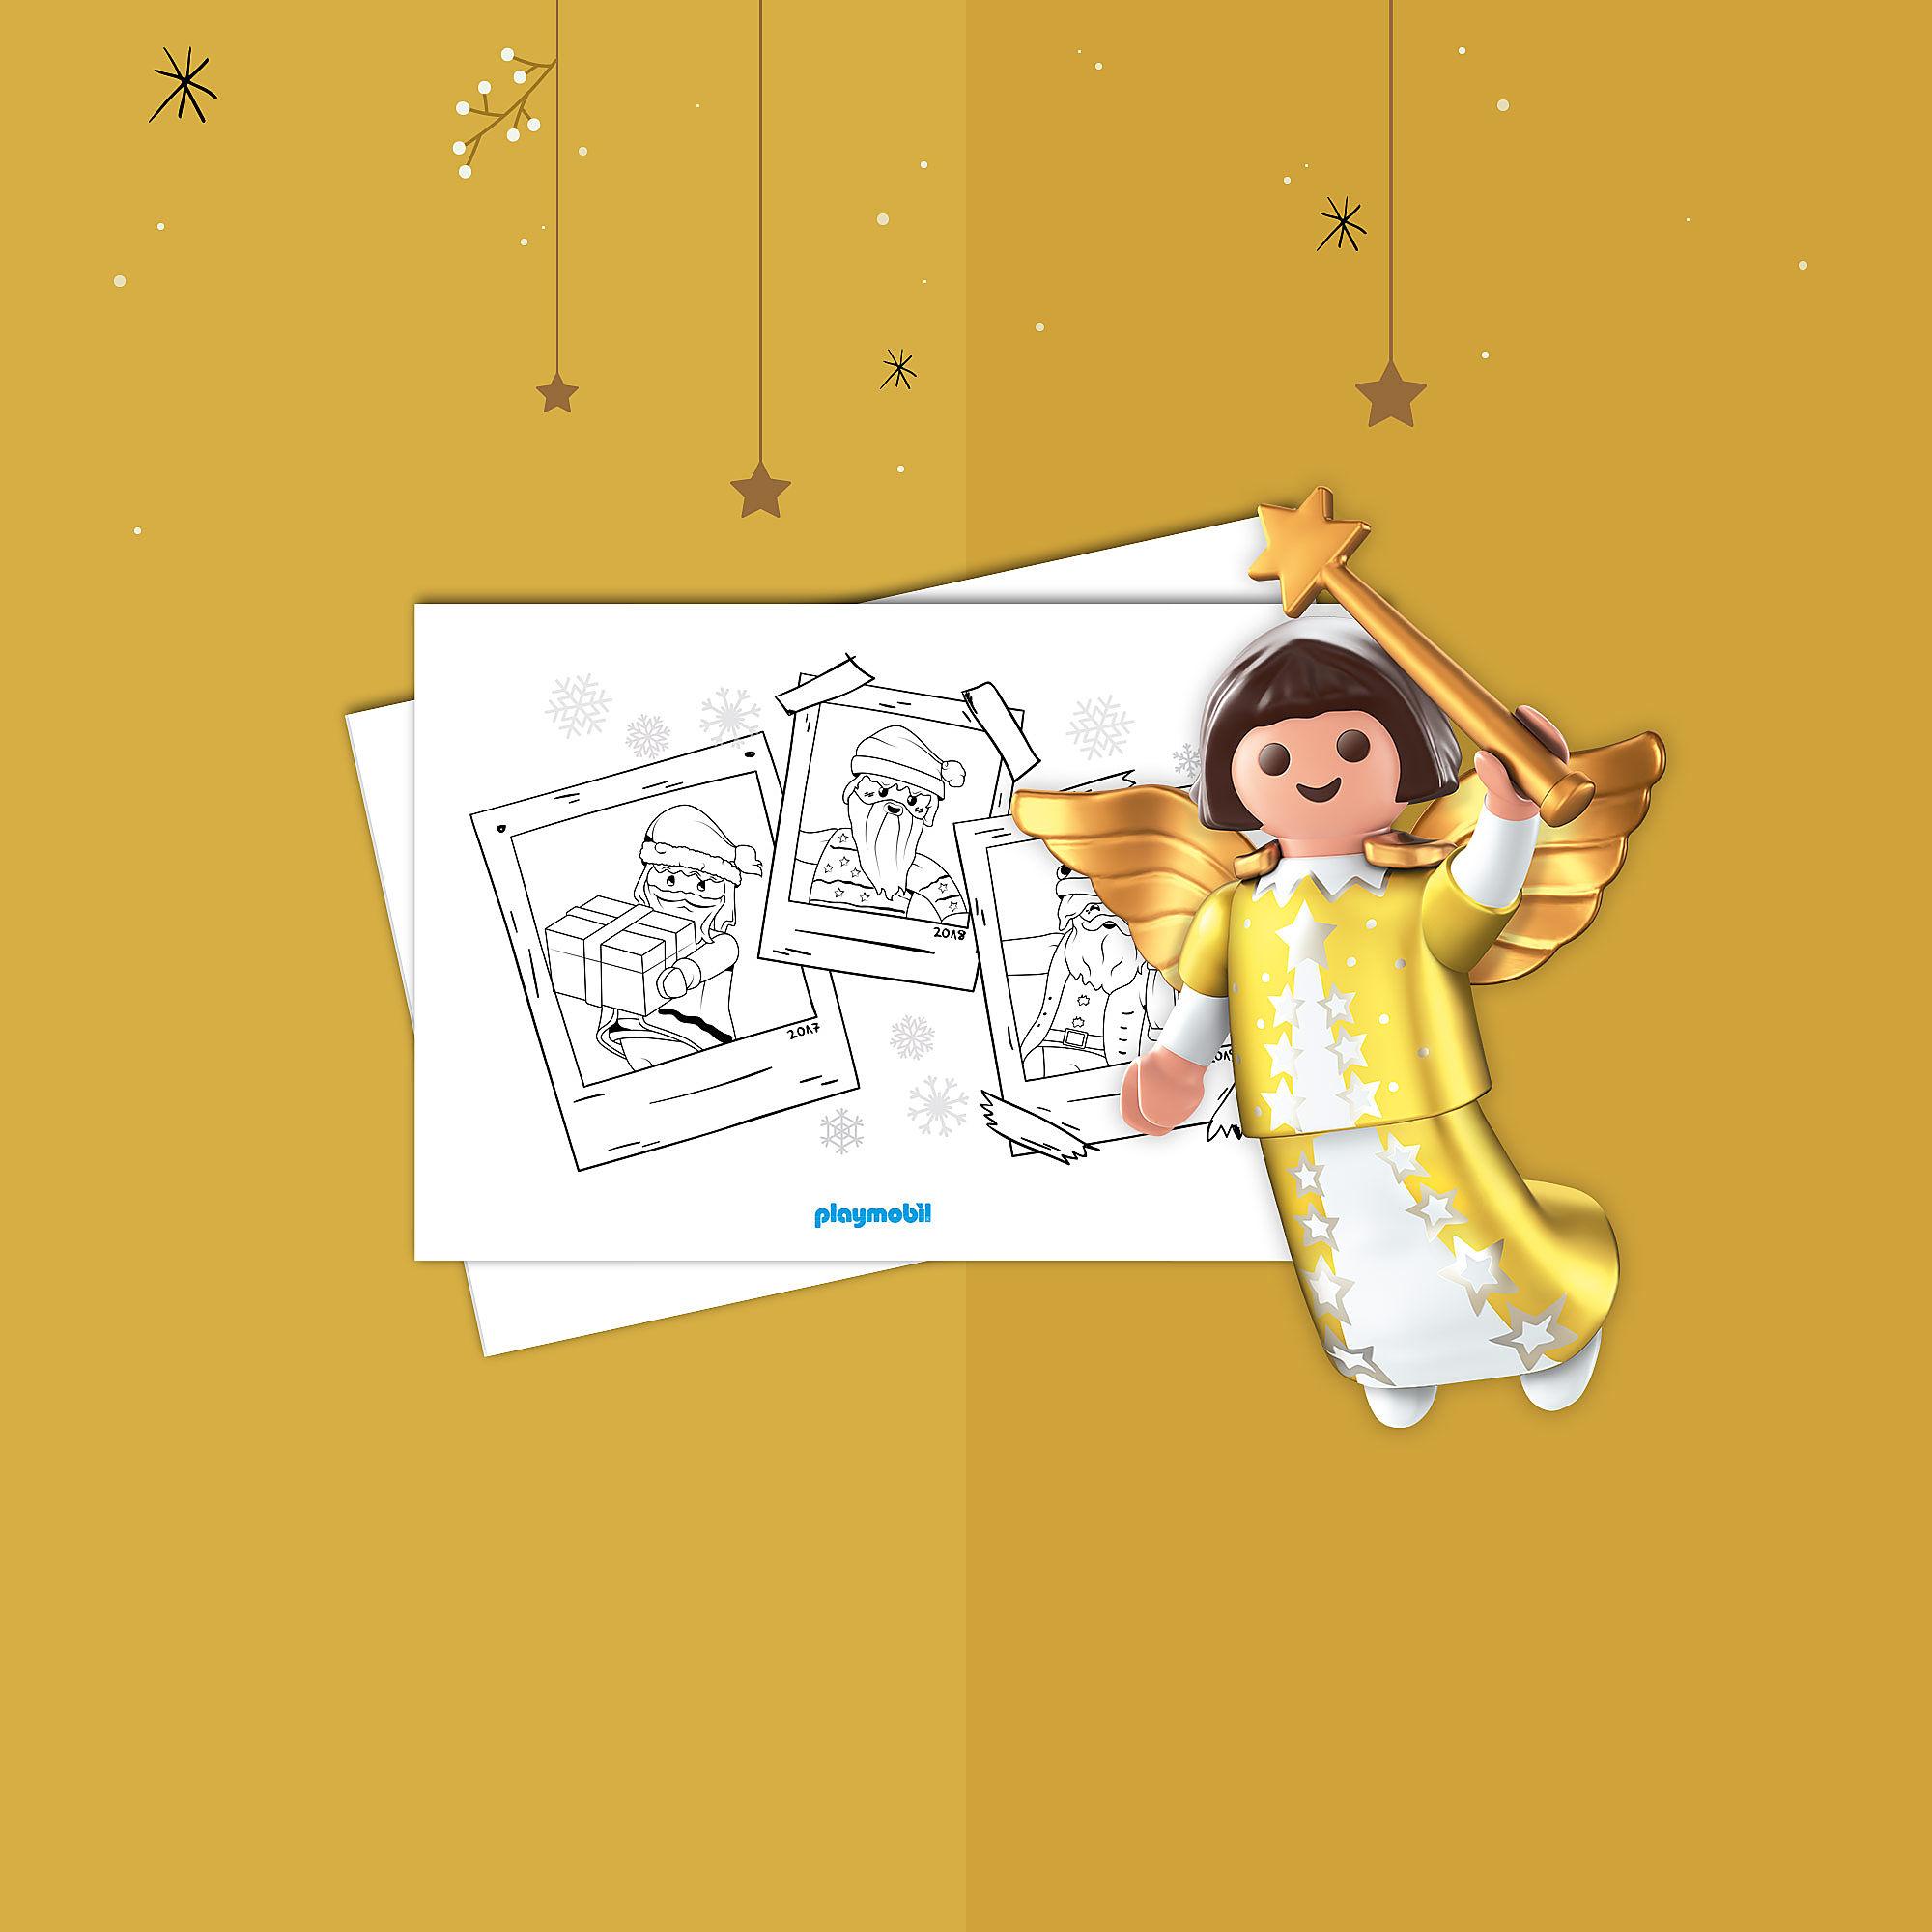 Coloring Sheet Playmobil Christmas